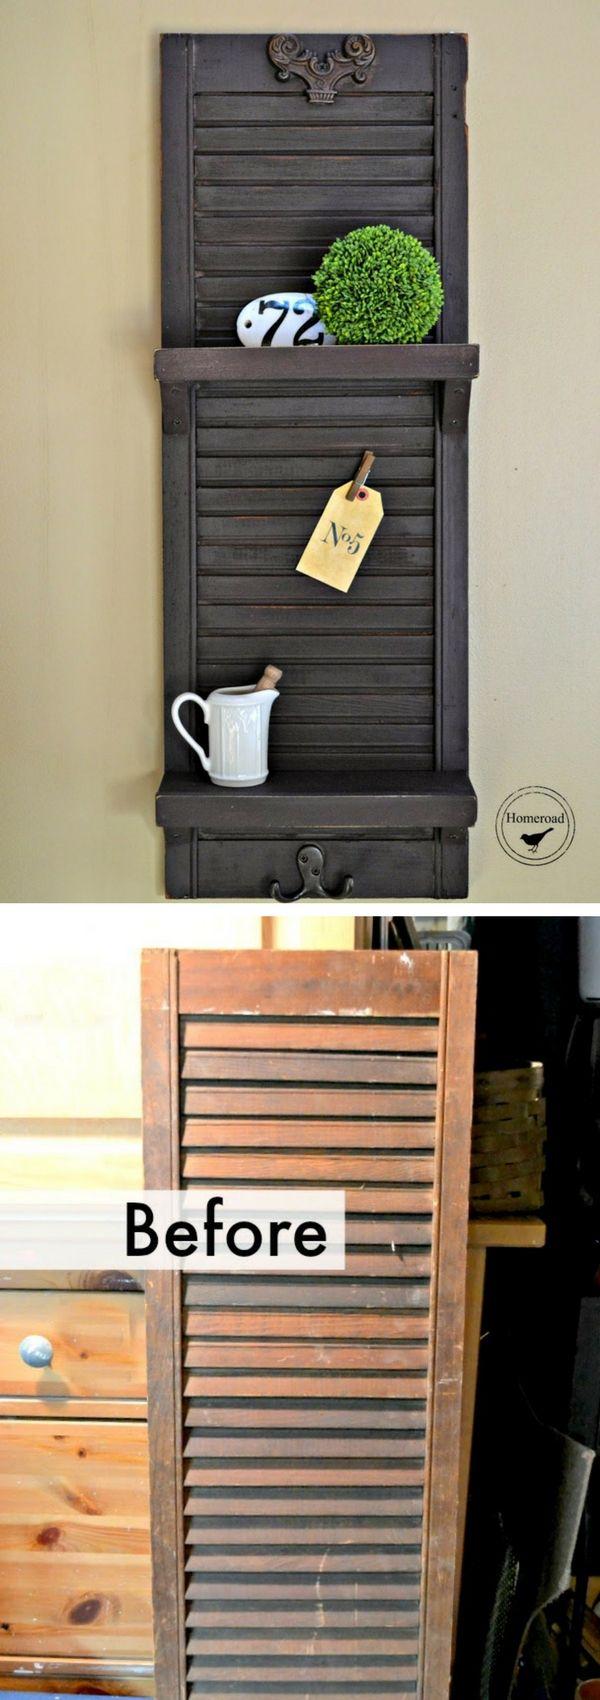 25+ unique Old shutters ideas on Pinterest | Old shutters decor ...